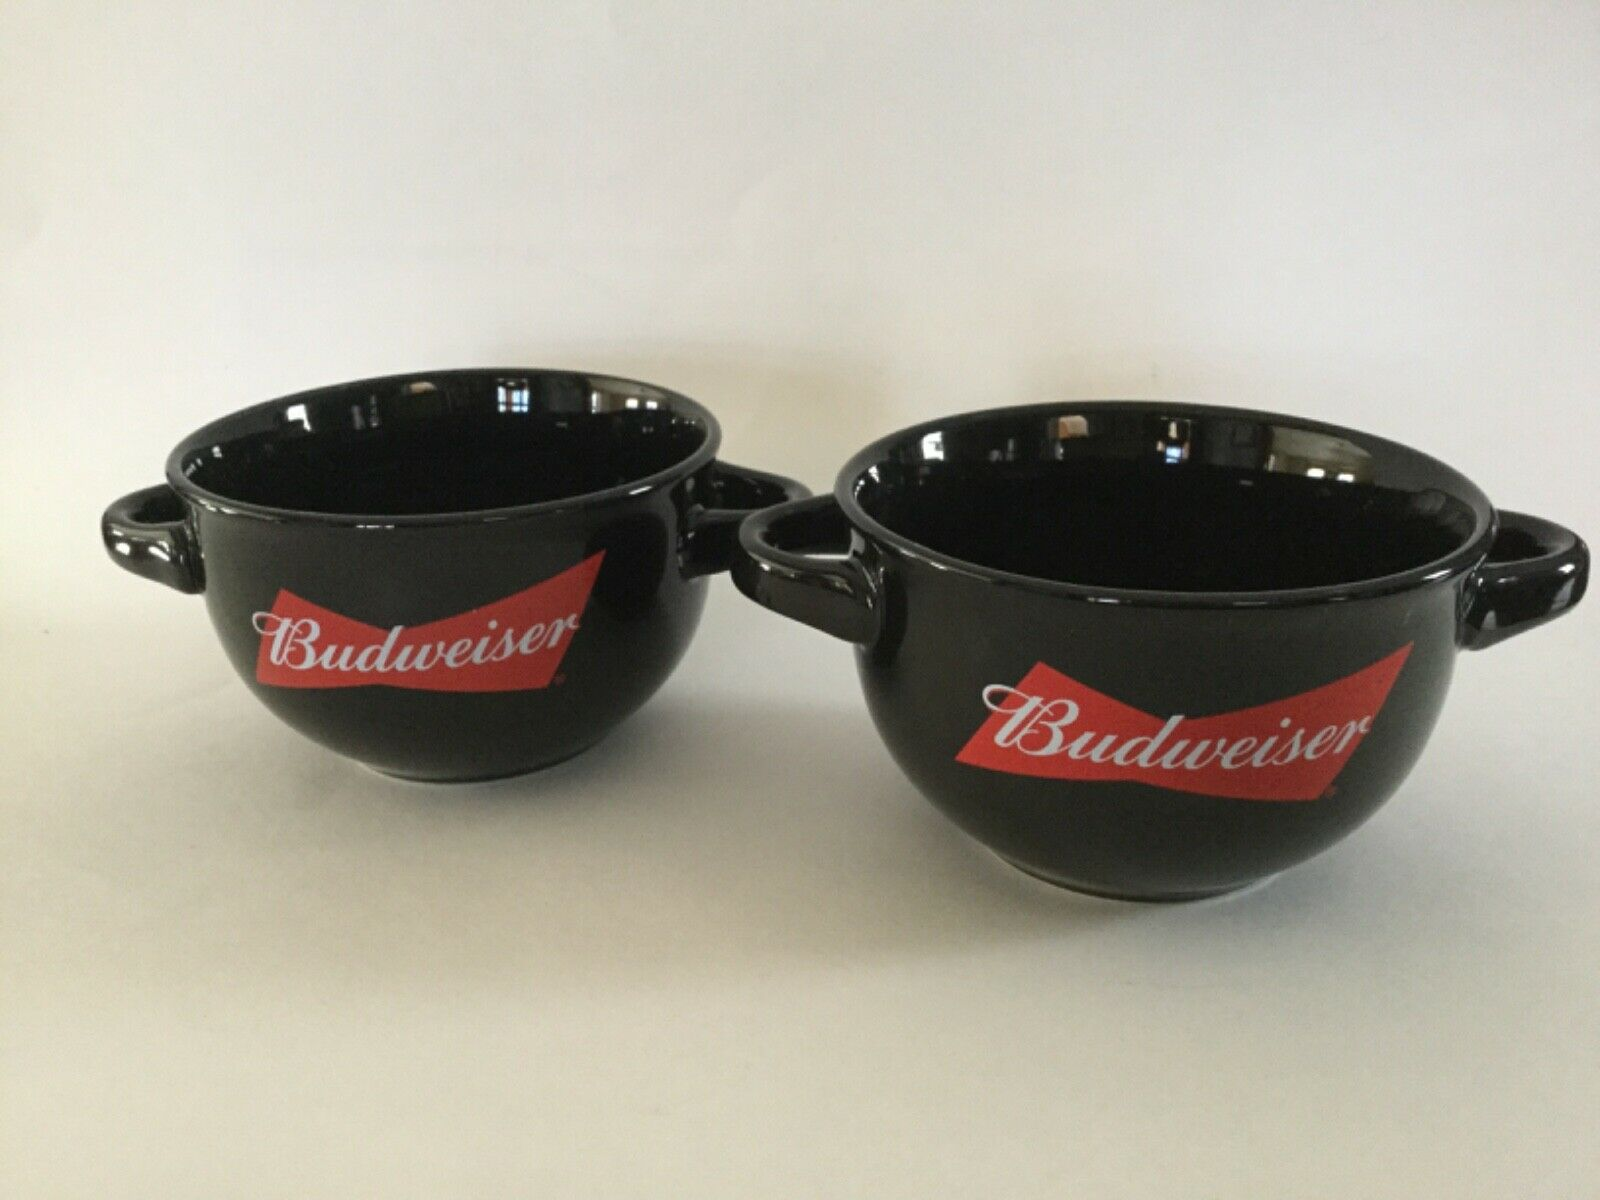 Budweiser Chili Bowl Dip set of 2 Soup